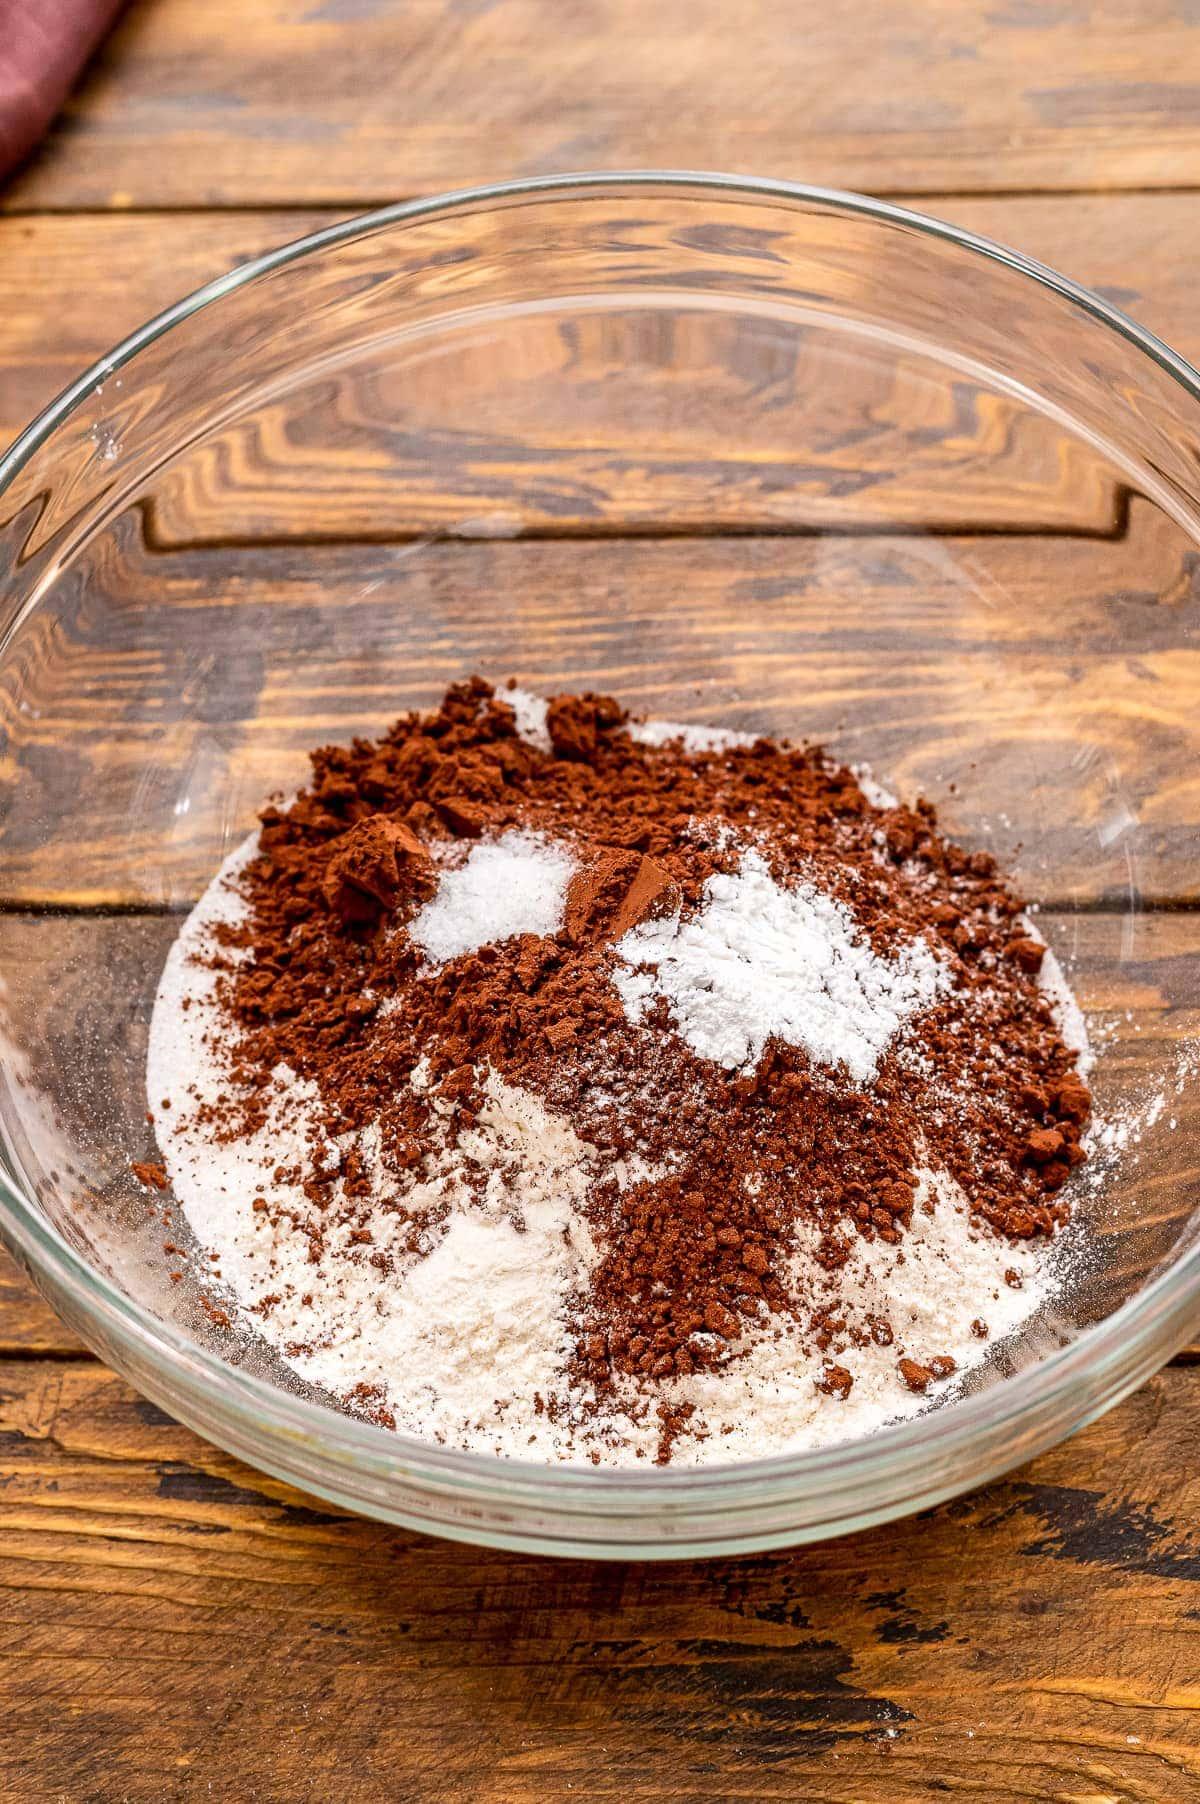 Brownie Ingredients in glass bowl before mixing.